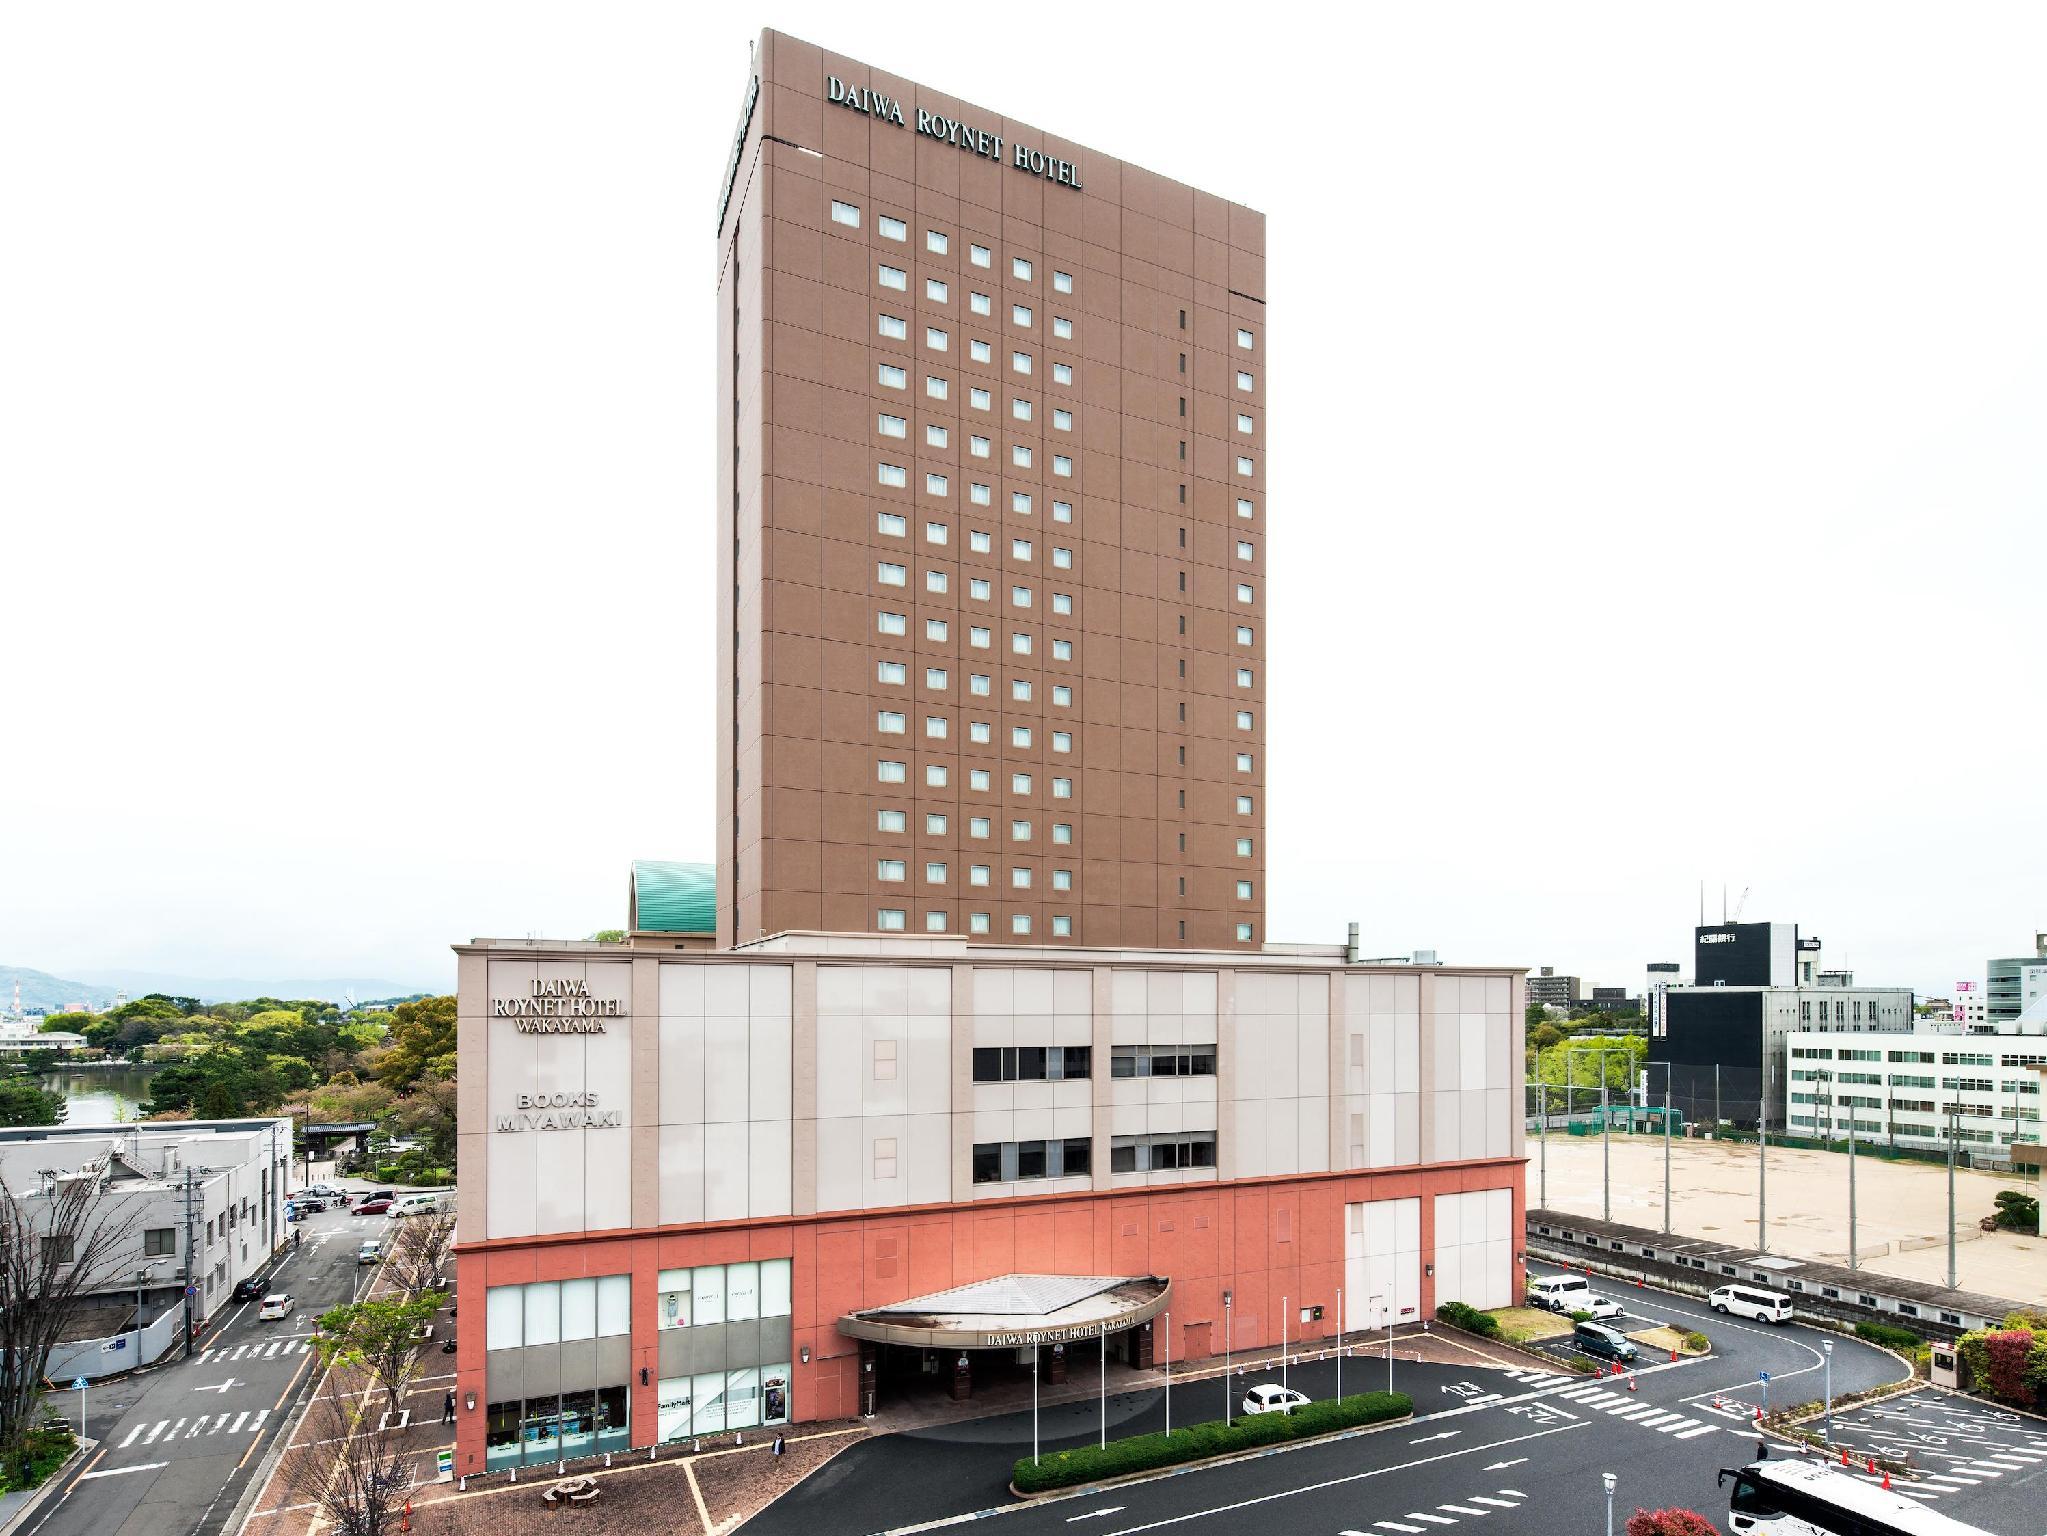 Daiwa Roynet Hotel Wakayama Castle, Wakayama